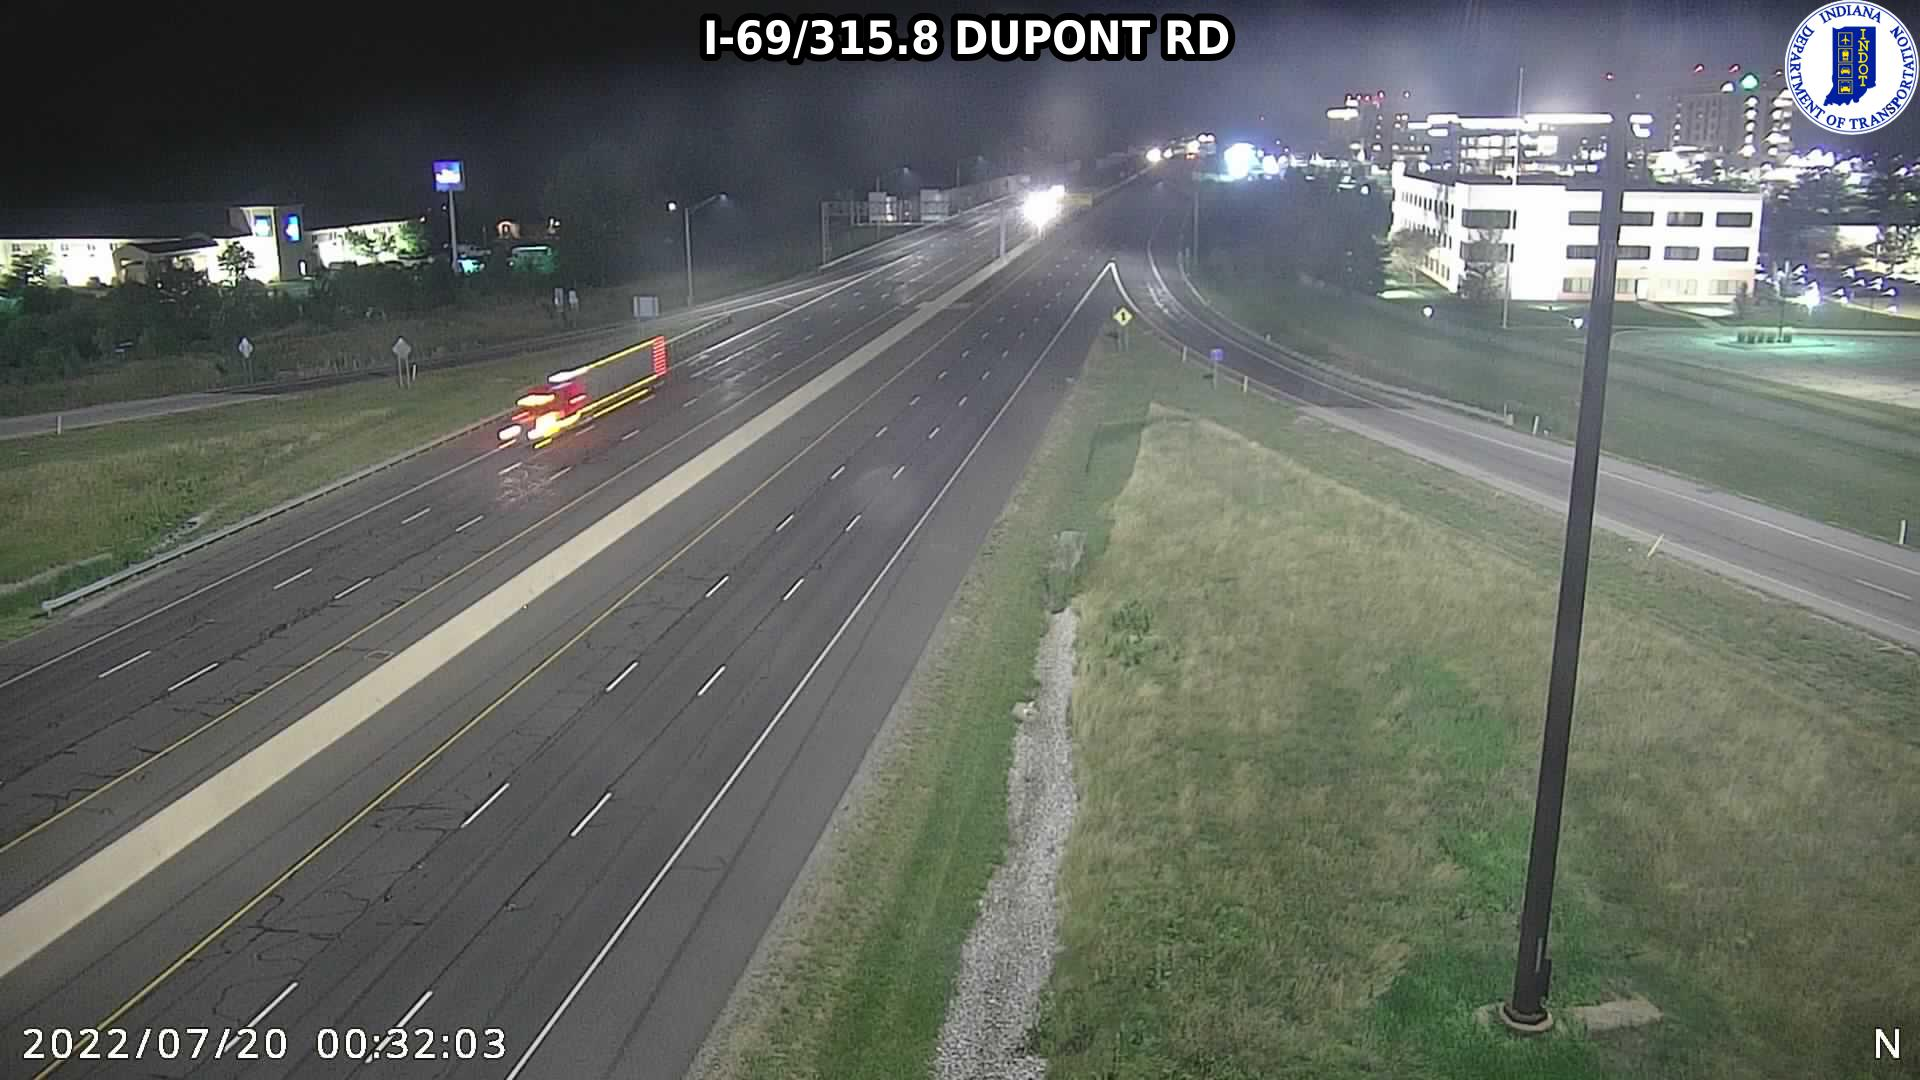 I-69 DUPONT ROAD CAM